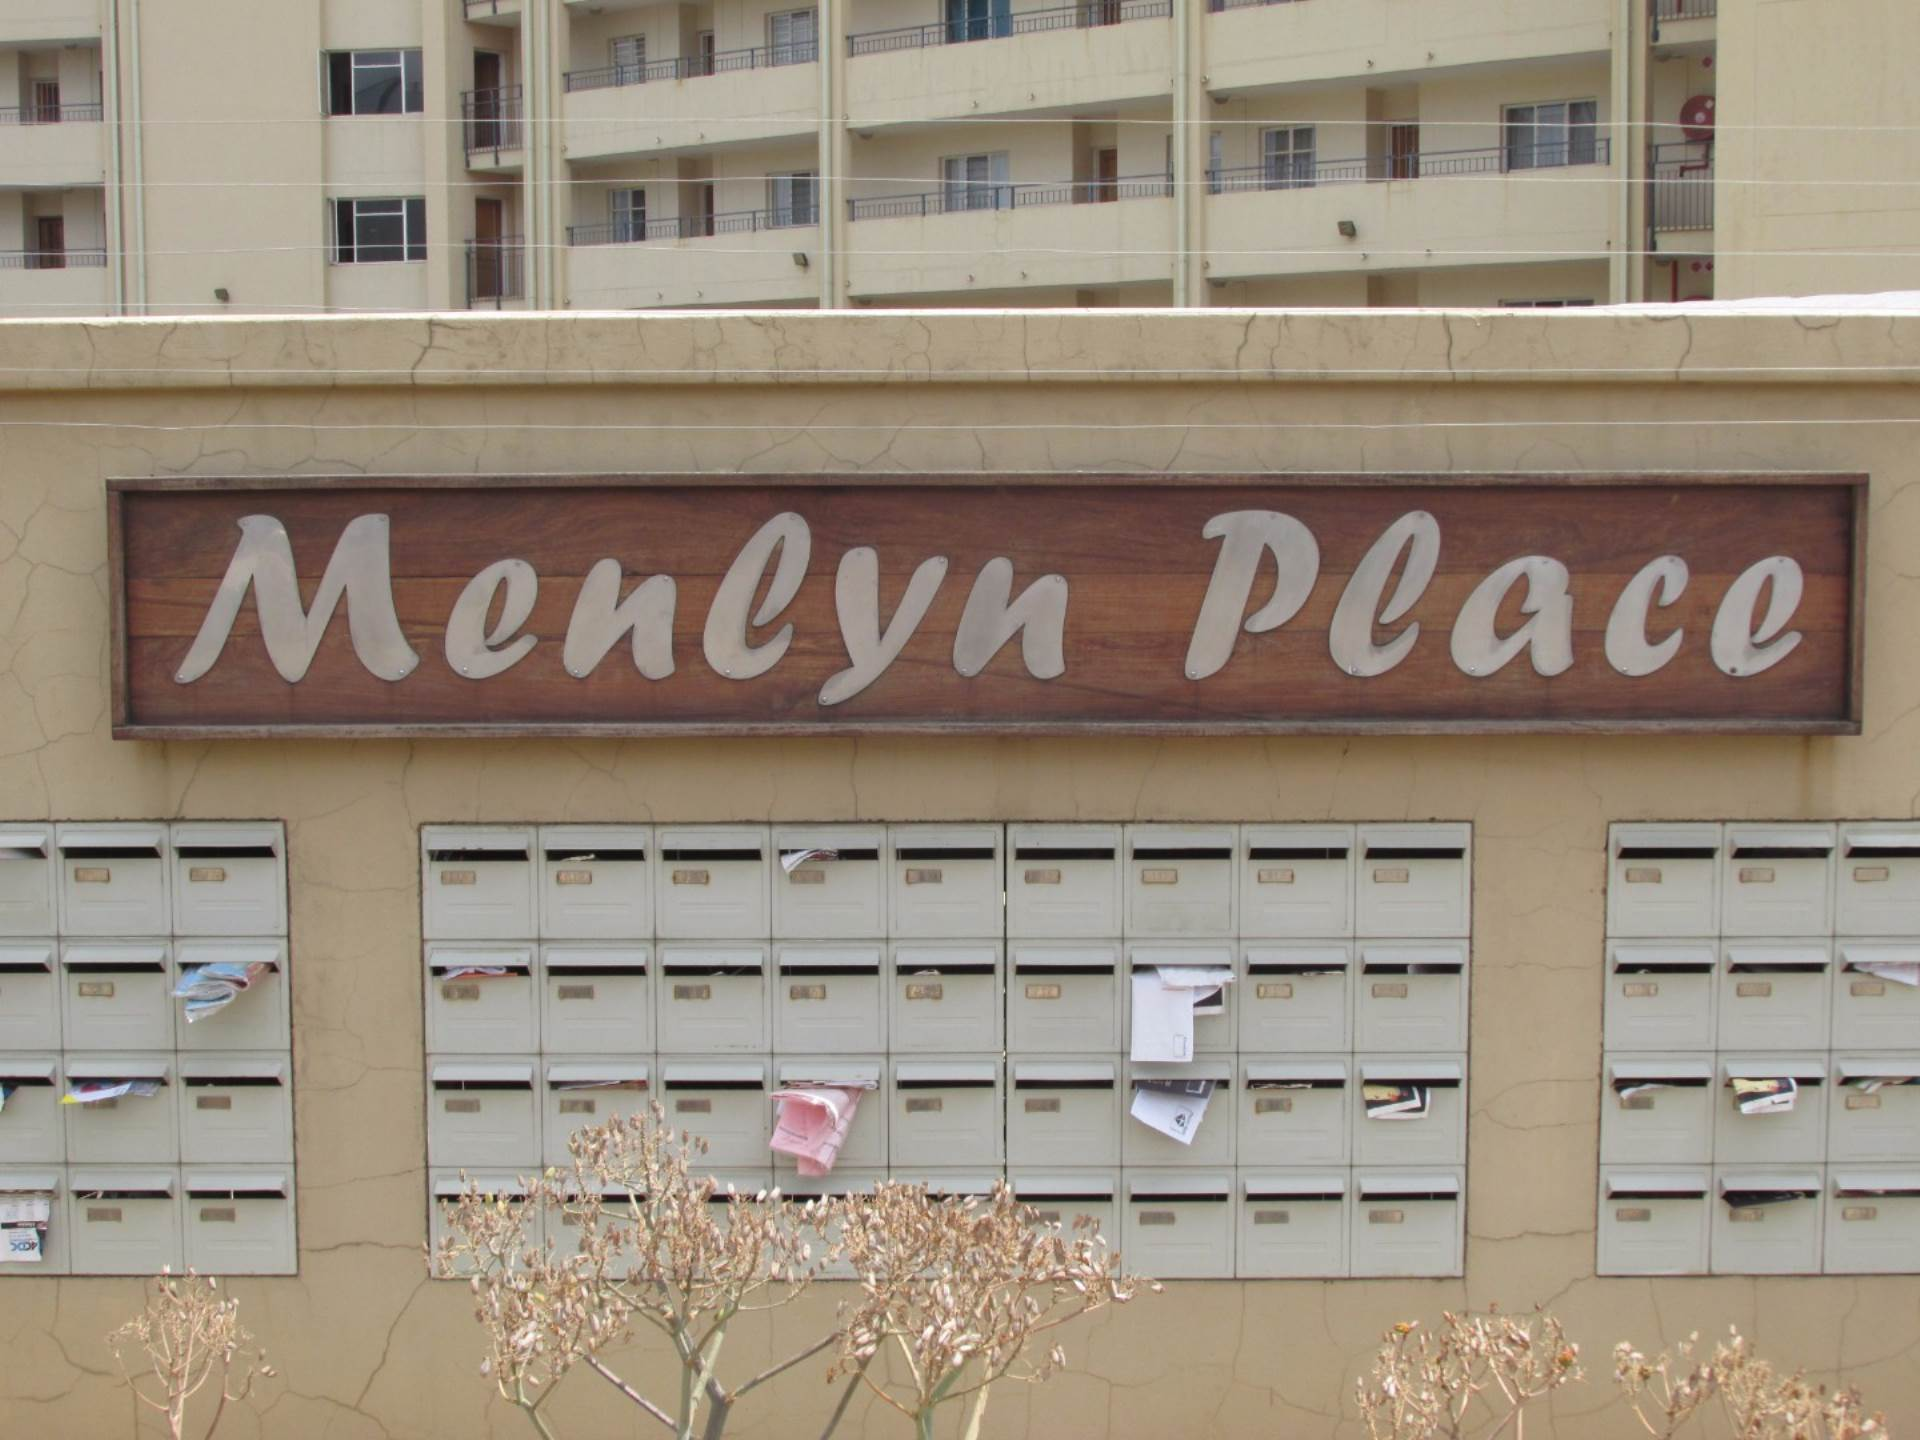 2 BedroomFlat To Rent In Menlyn